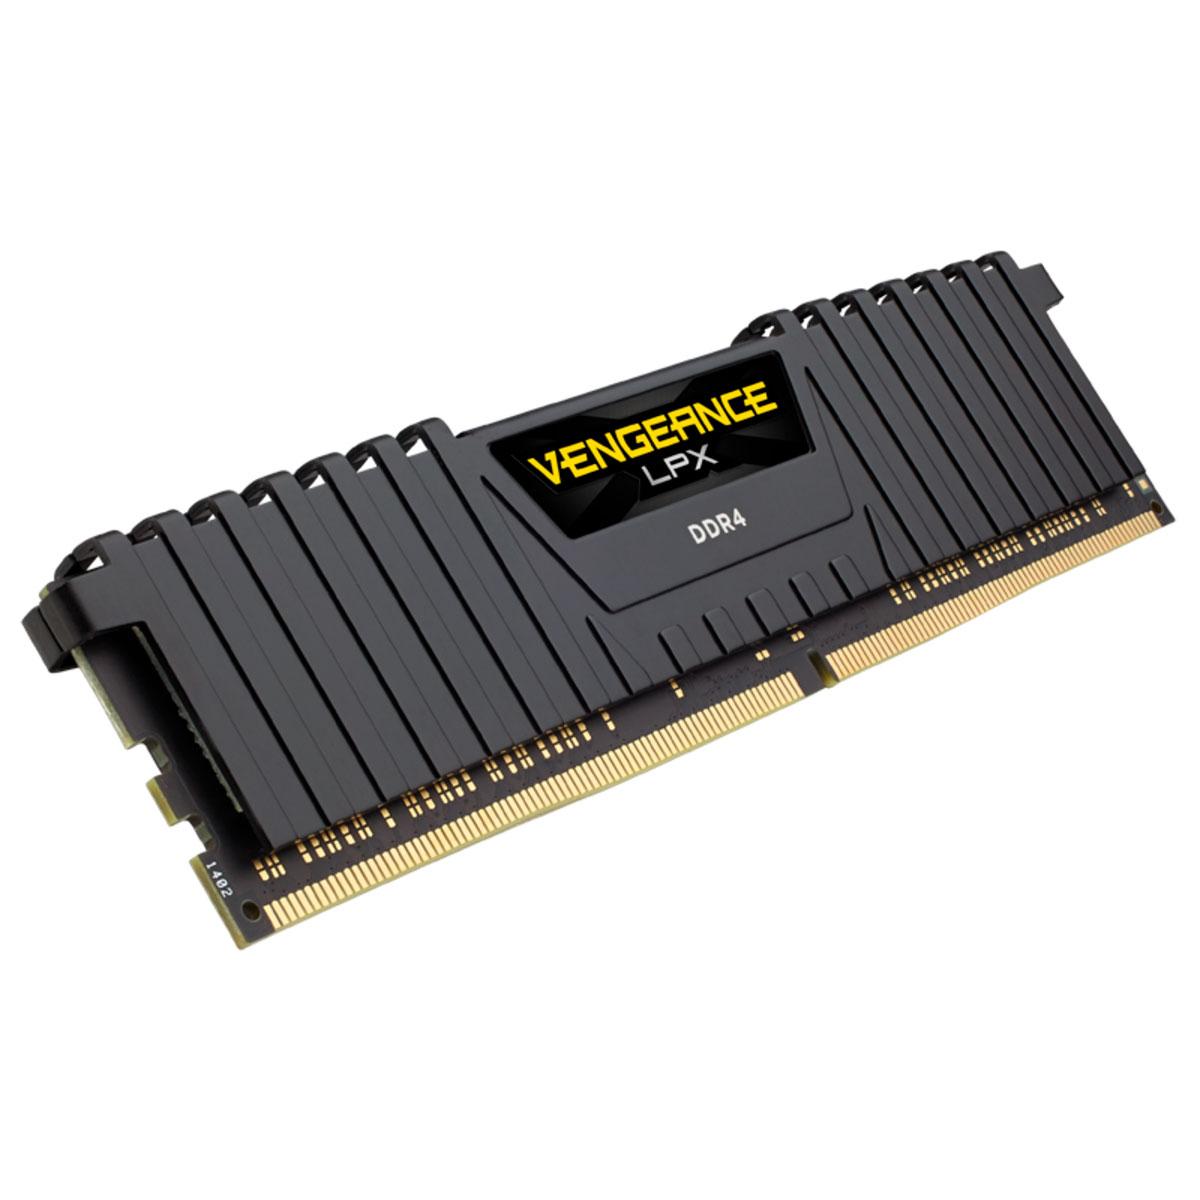 Memória Corsair Vengeance LPX 16GB DDR4 2400MHz CL16 CMK16GX4M1A2400C16